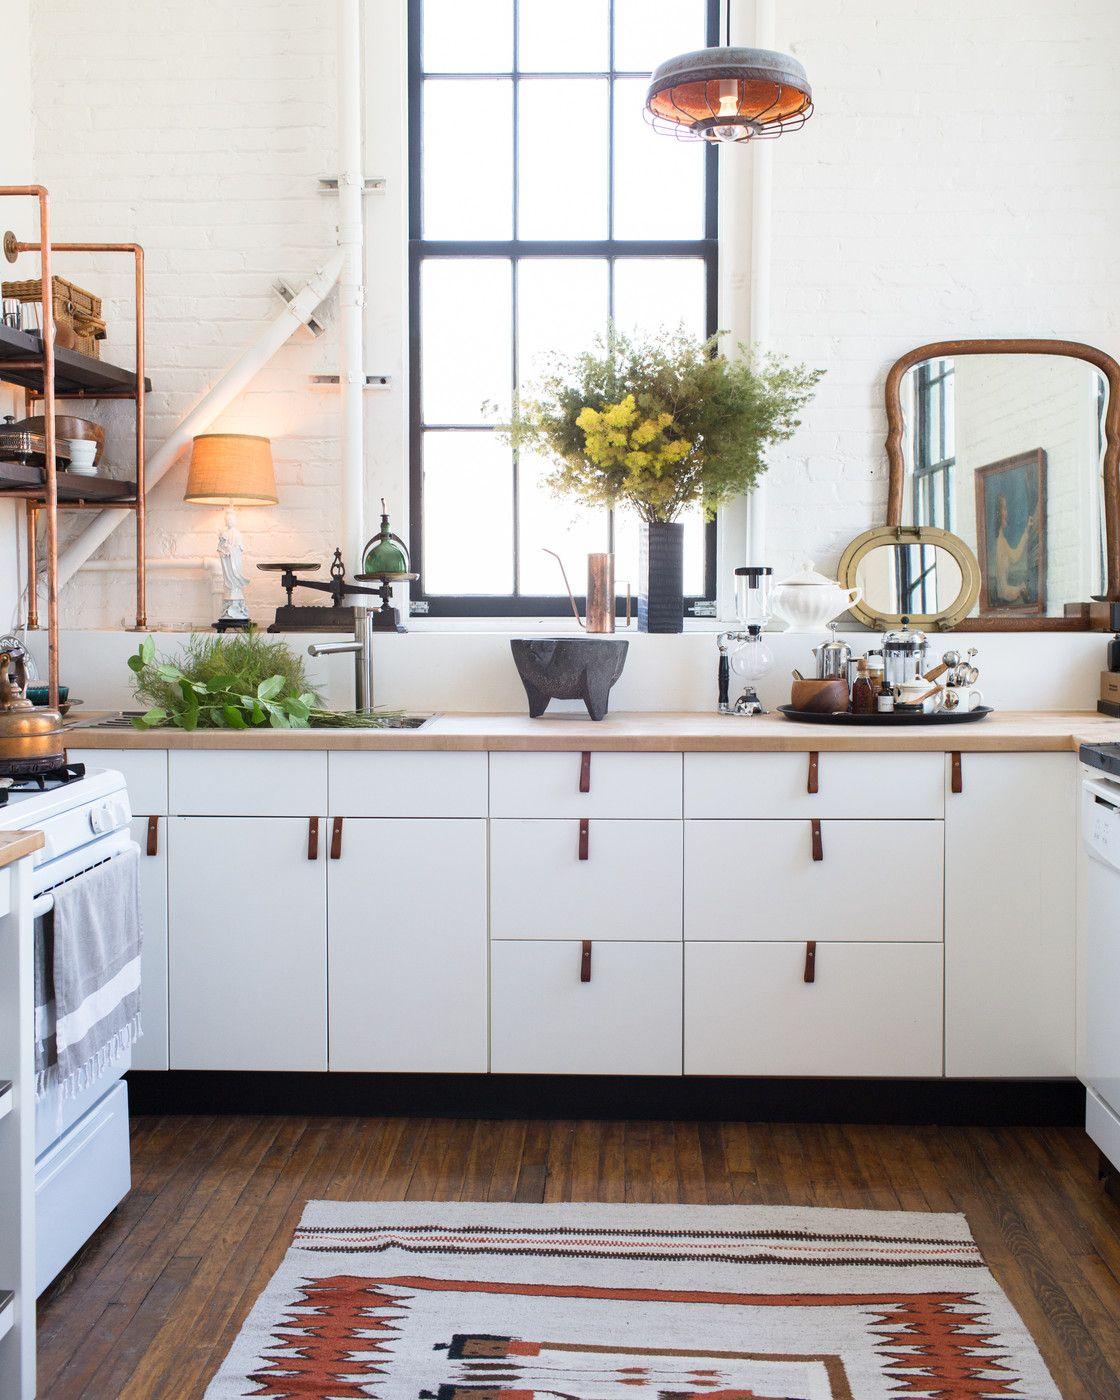 October 2013 | Kitchen cabinet pulls, Kitchens and Kitchen photos